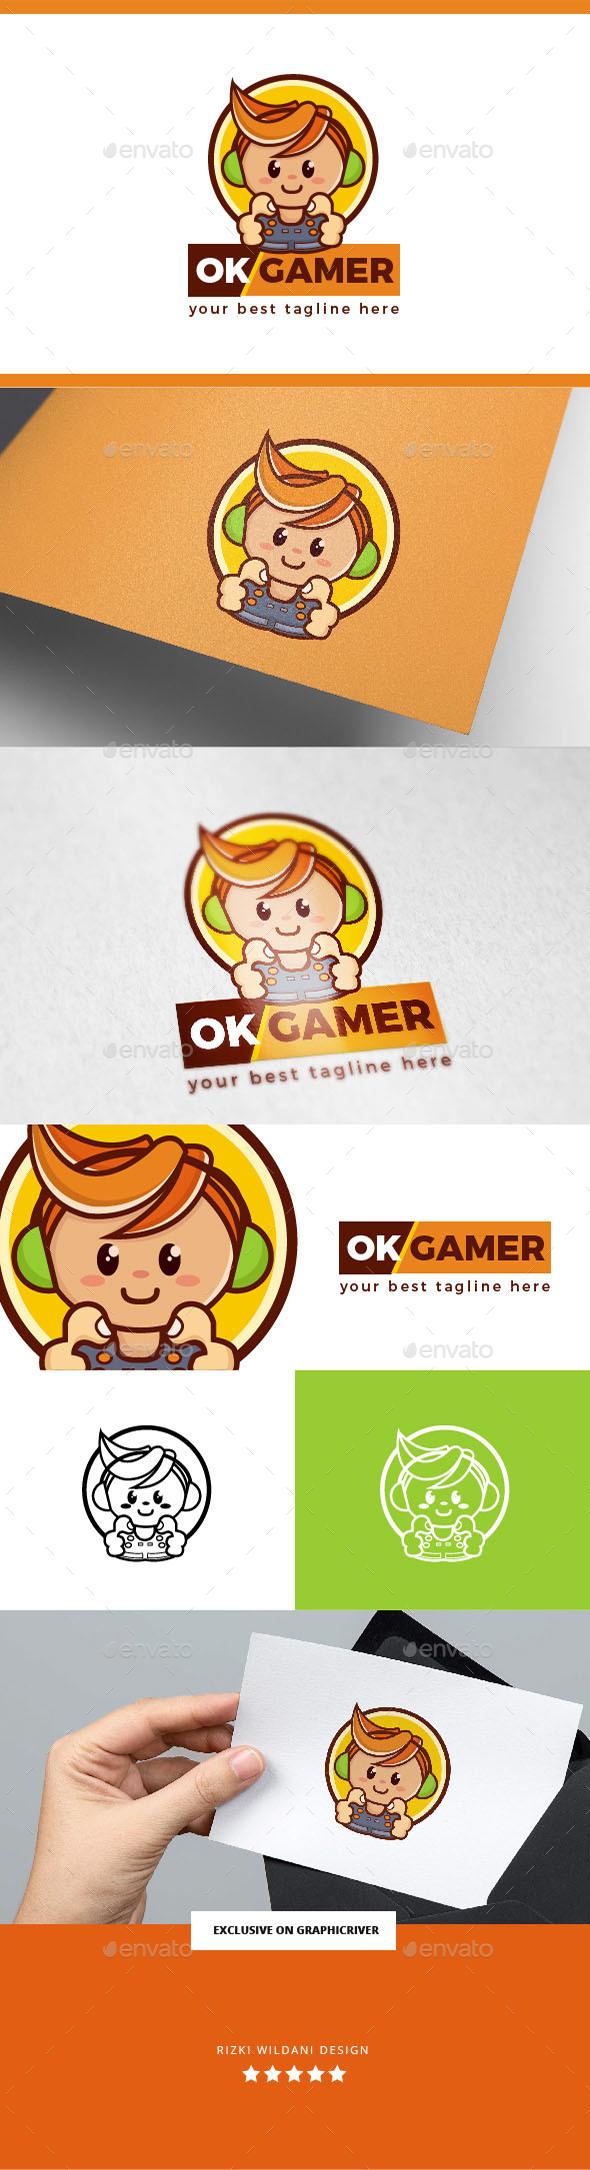 OK Gamer Geek Logo Template - Vector Abstract